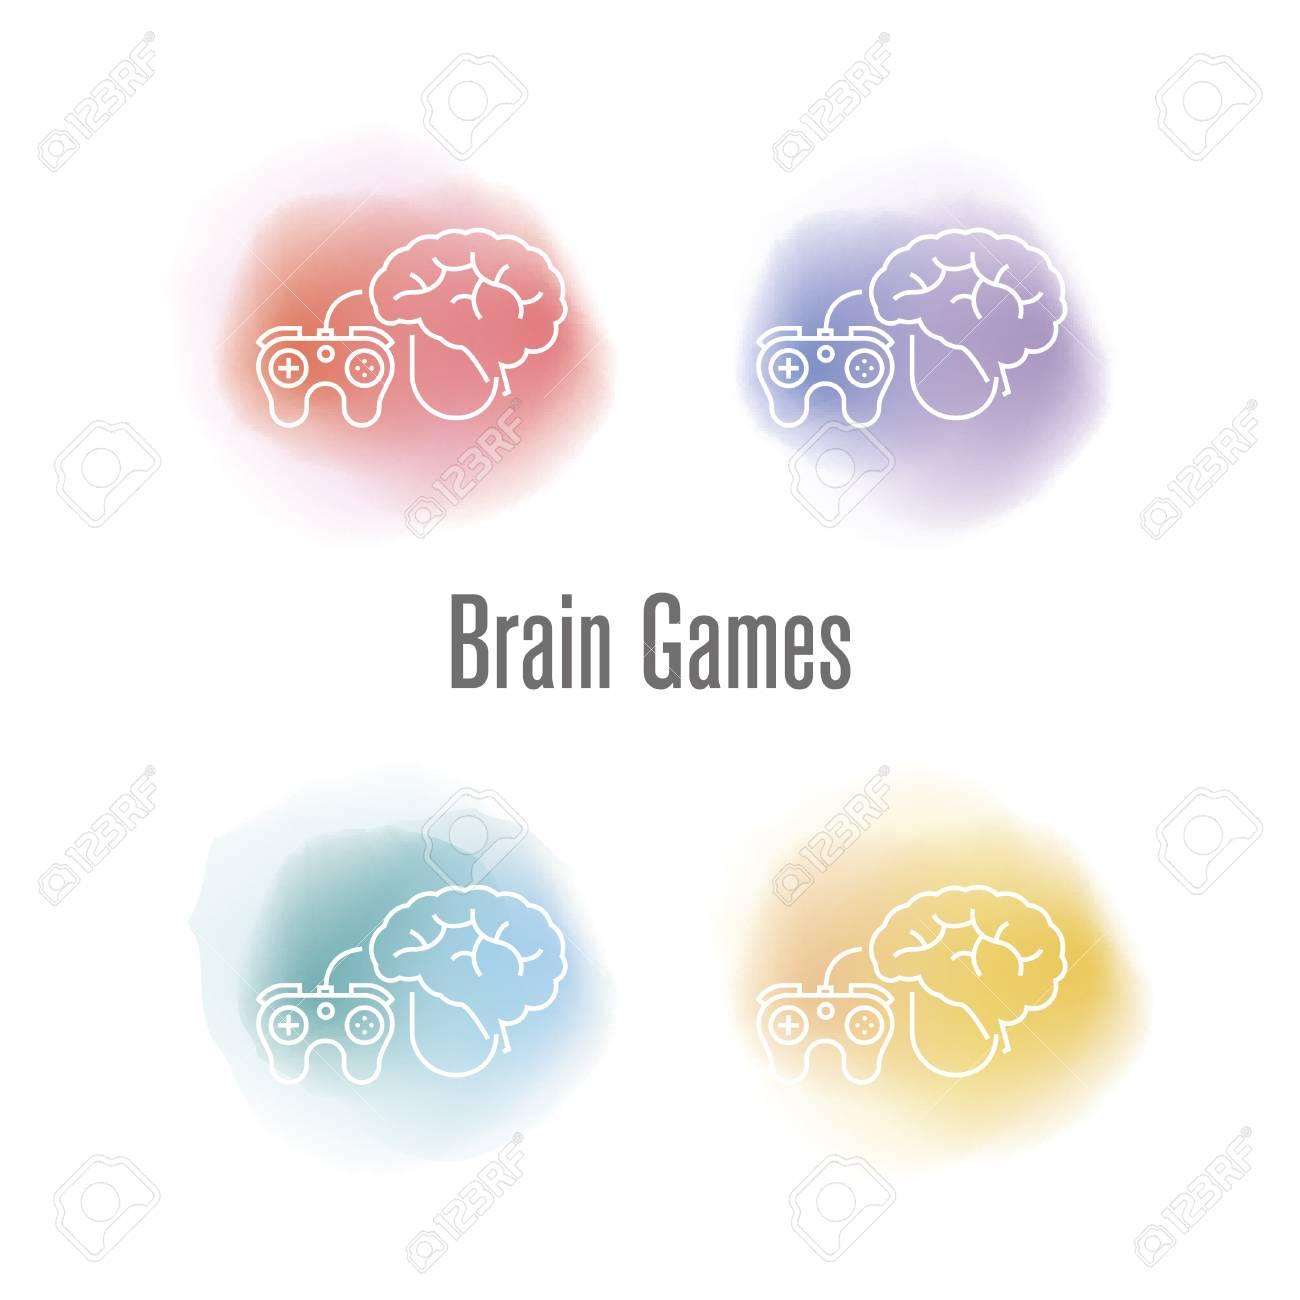 Brain Games Concept